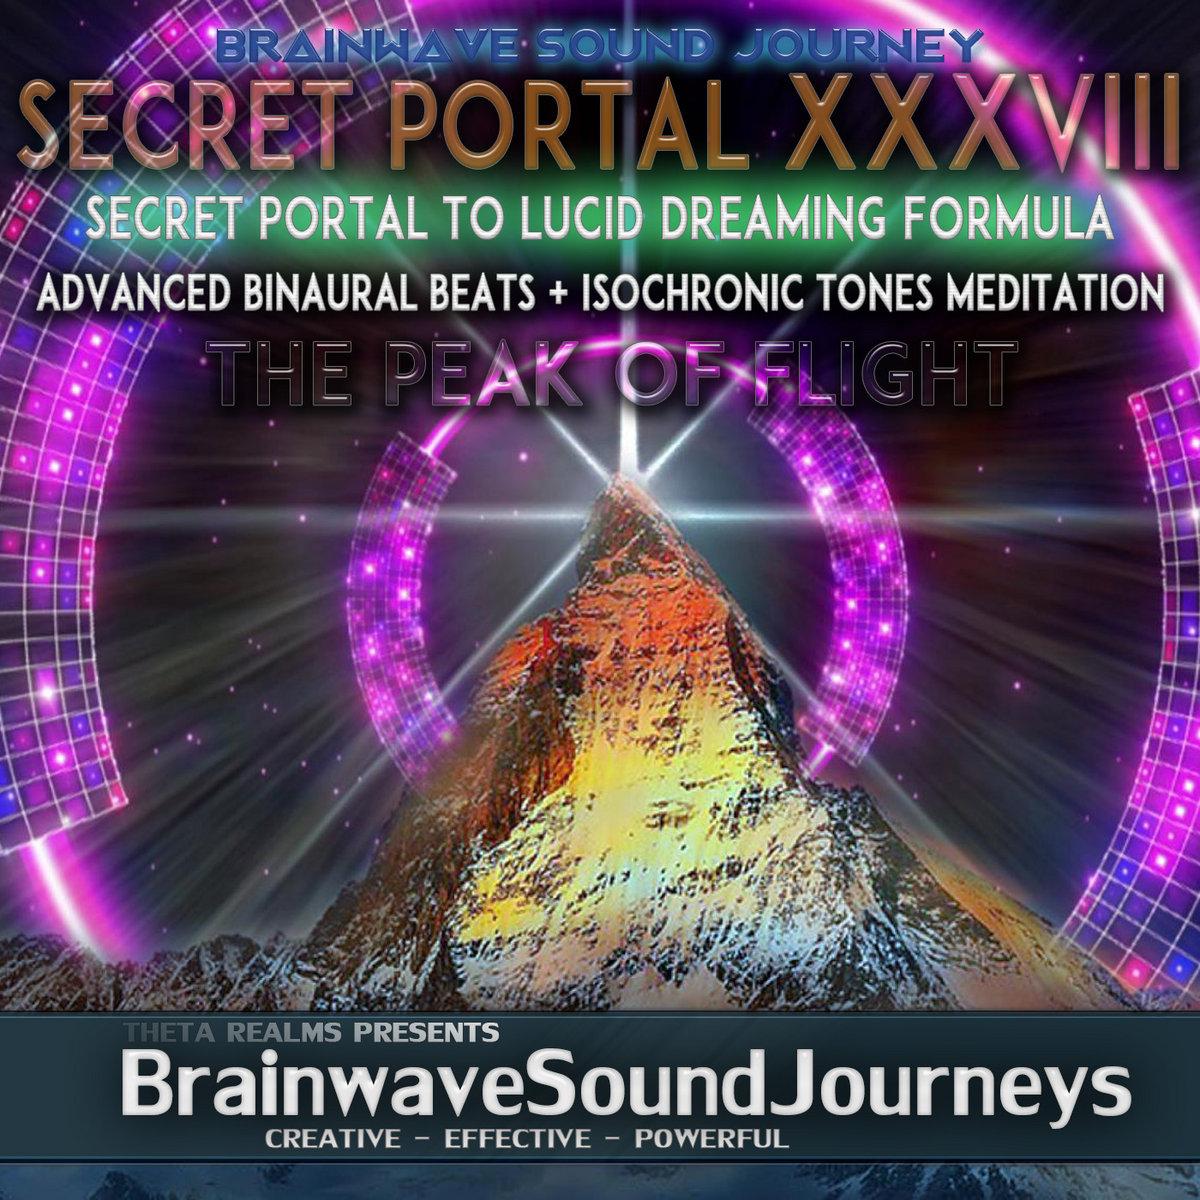 POWERFUL SECRET PORTAL XXXVIII🔹PEAK OF FLIGHT🔹Binaural Beats